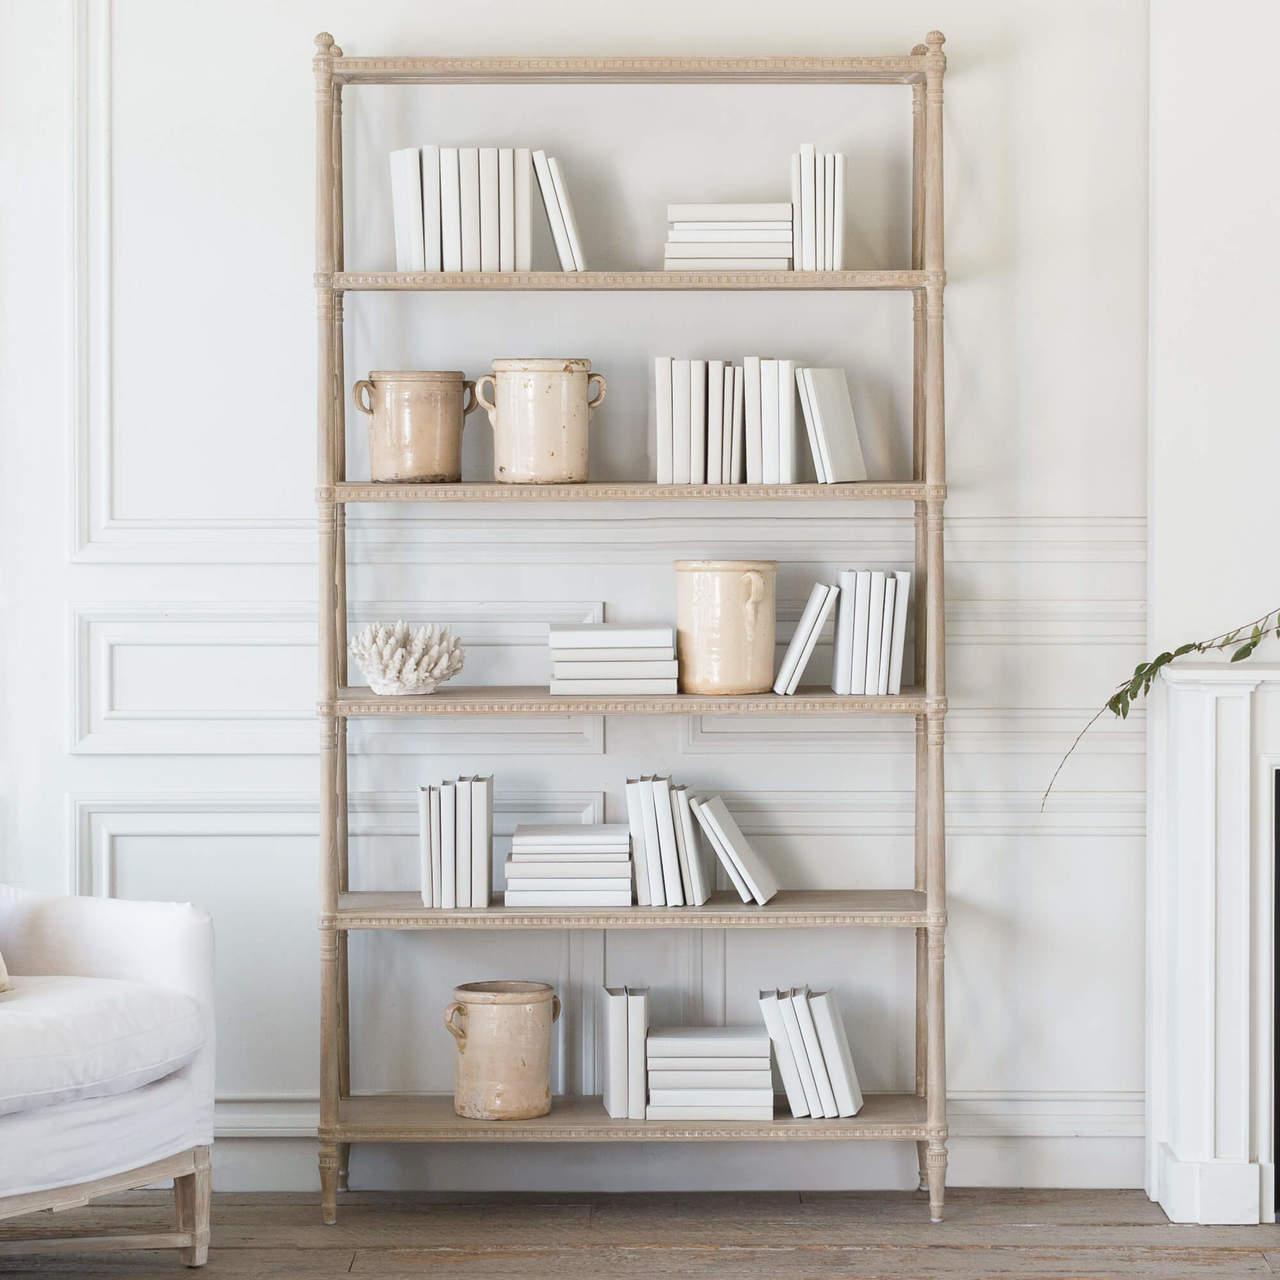 Tresor Bookshelf In Rustic Wood Refined Craftsmanship Eloquence